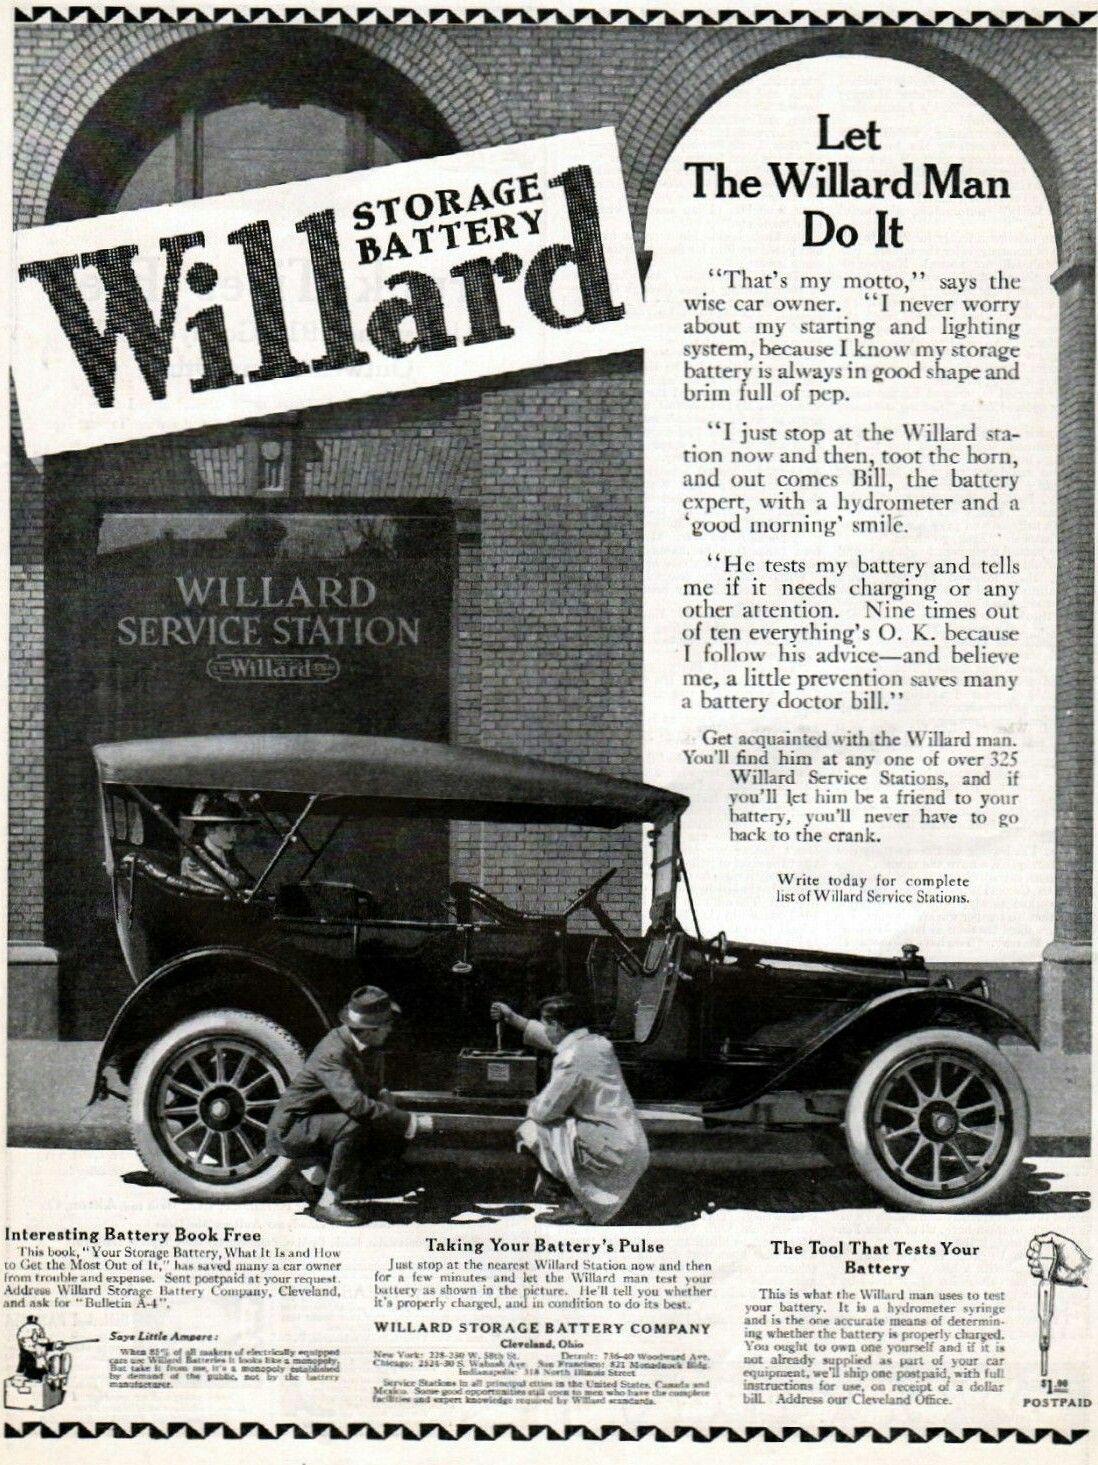 Willard Storage Battery Co 1915 Vintage Car Accessory Parts Ads